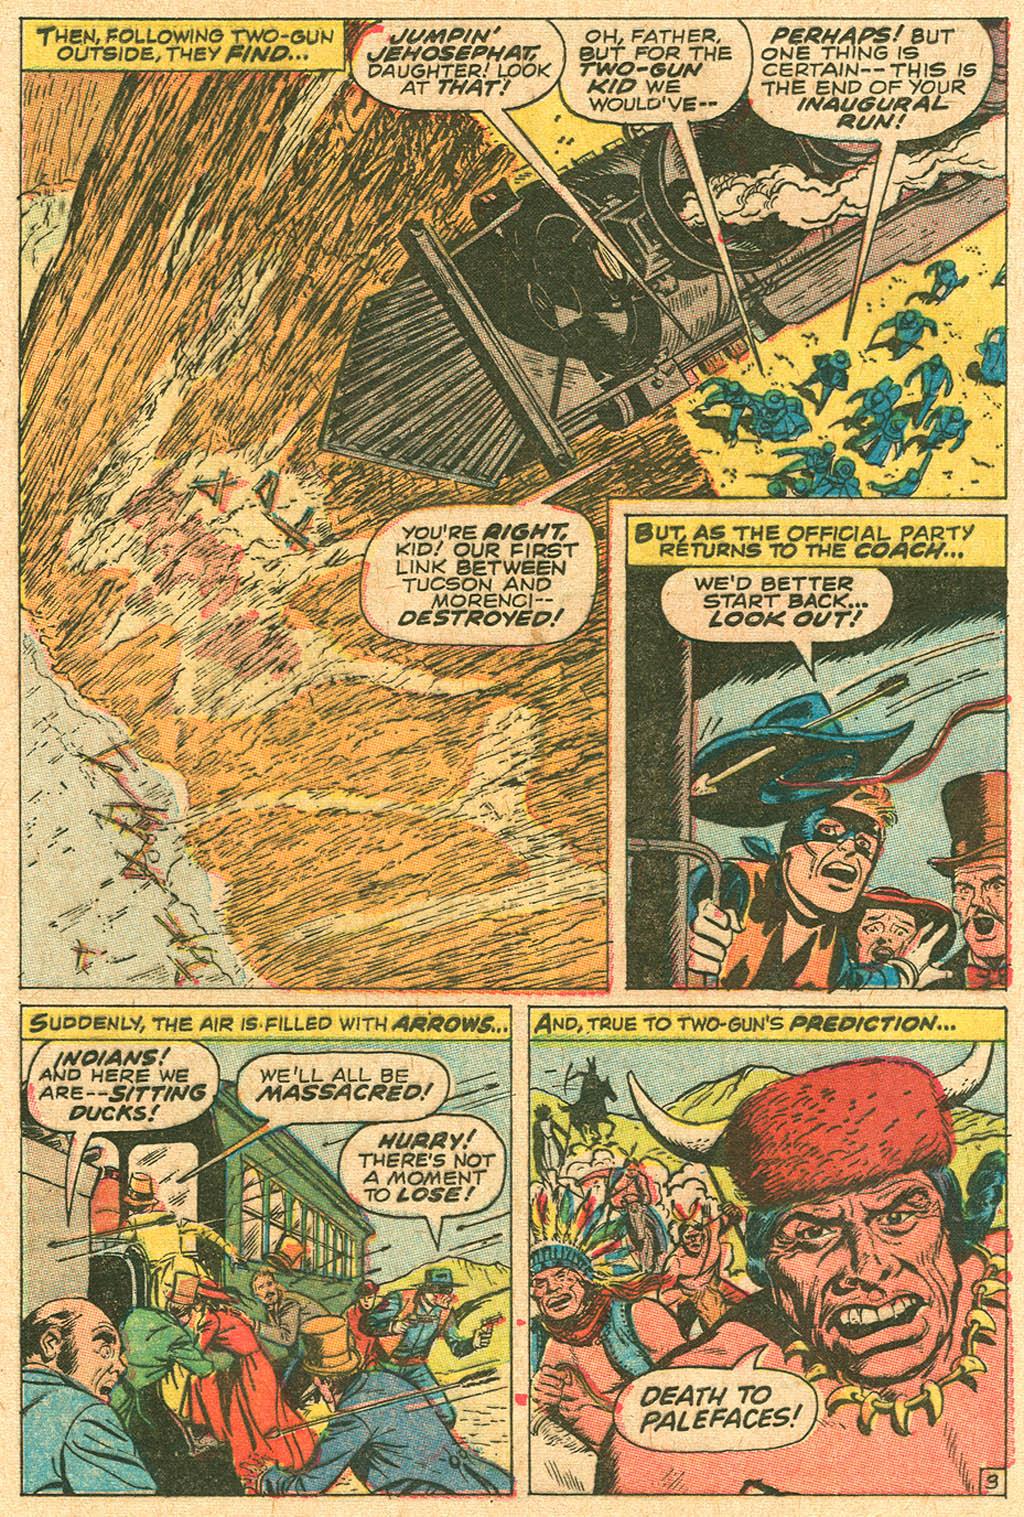 Read online Two-Gun Kid comic -  Issue #92 - 16